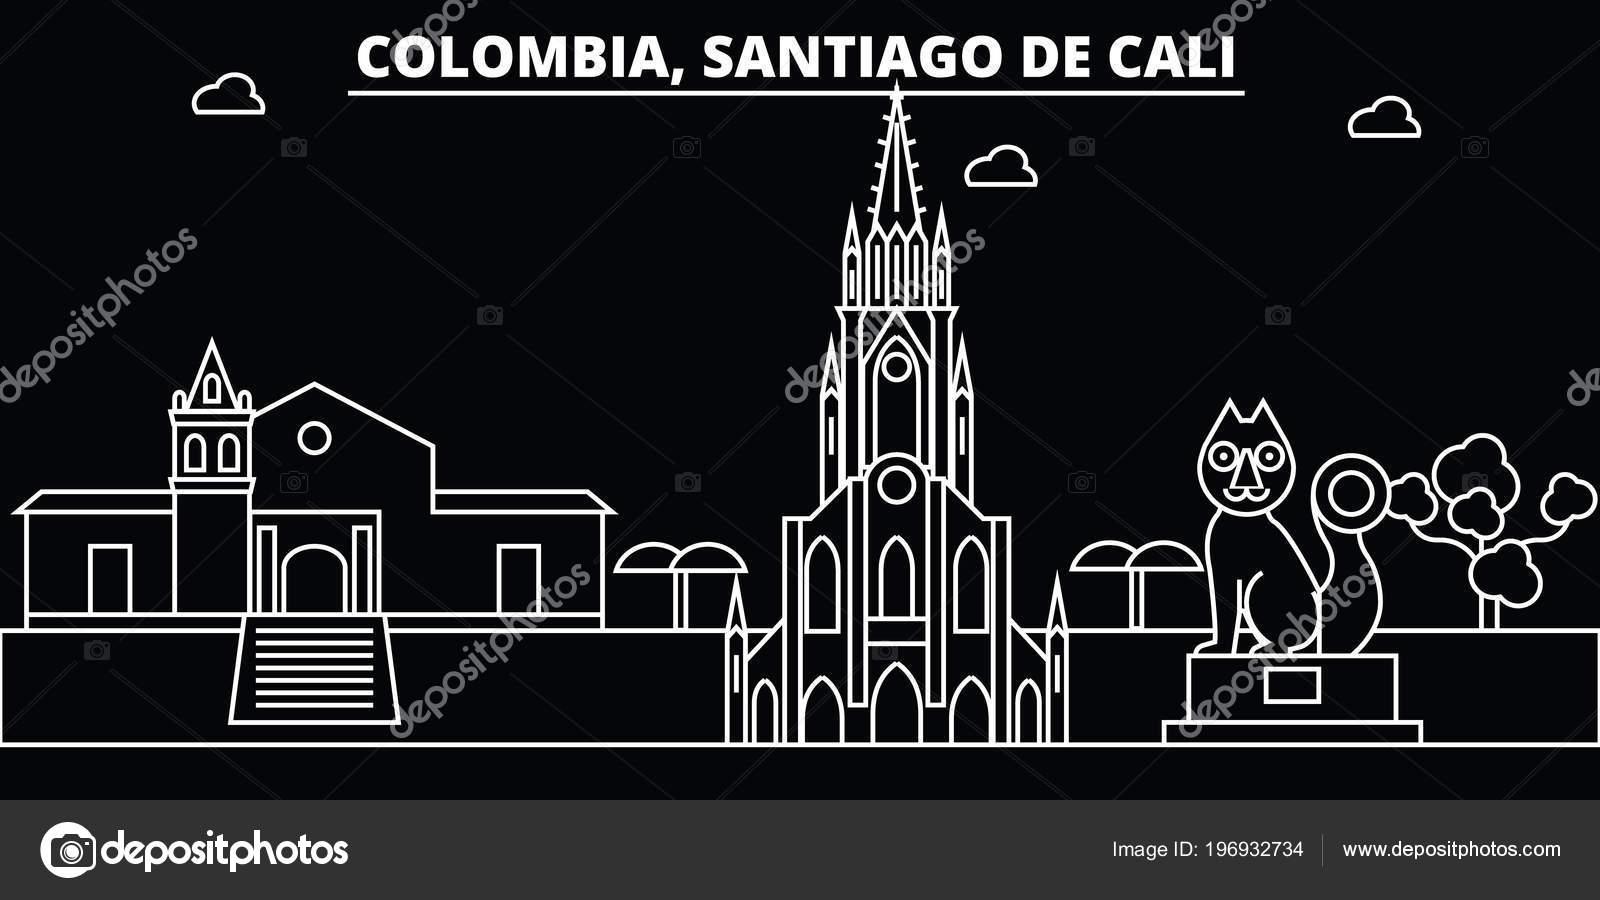 Cali Colombia Wallpaper Santiago De Cali Skyline Colombia